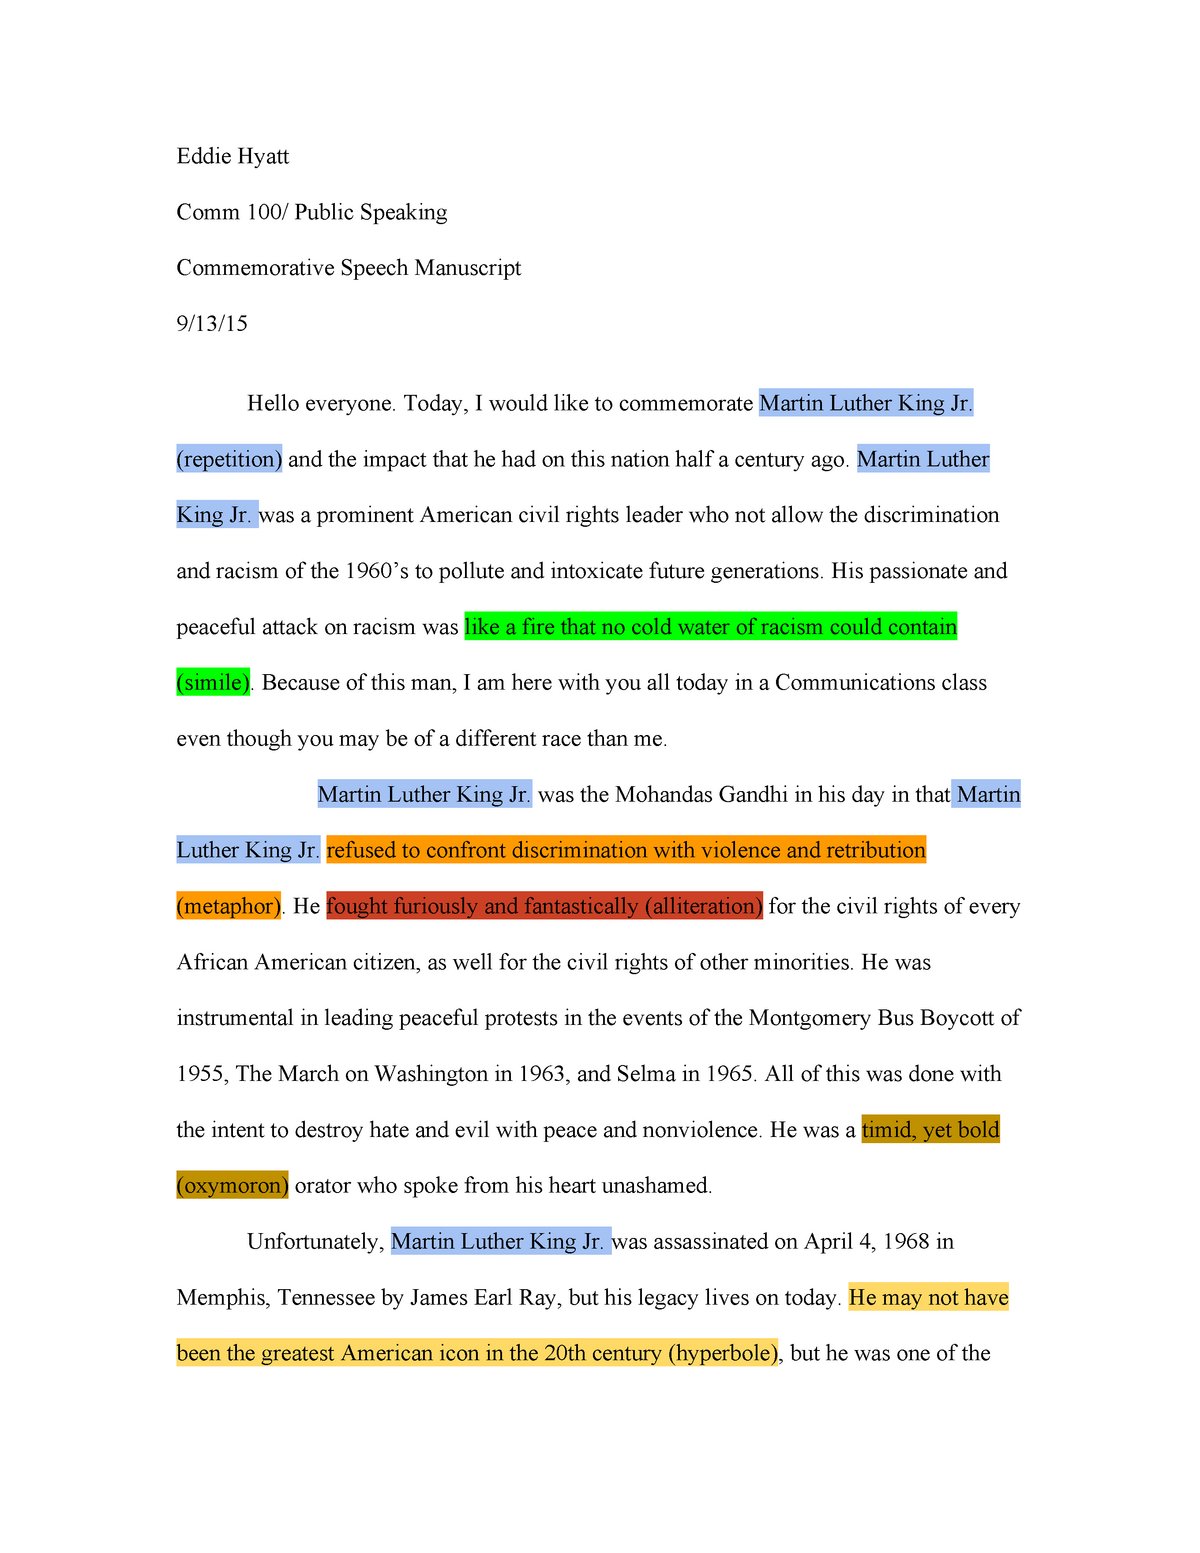 Eddie Hyatt - Final Draft Commemorative Speech - COMM 100